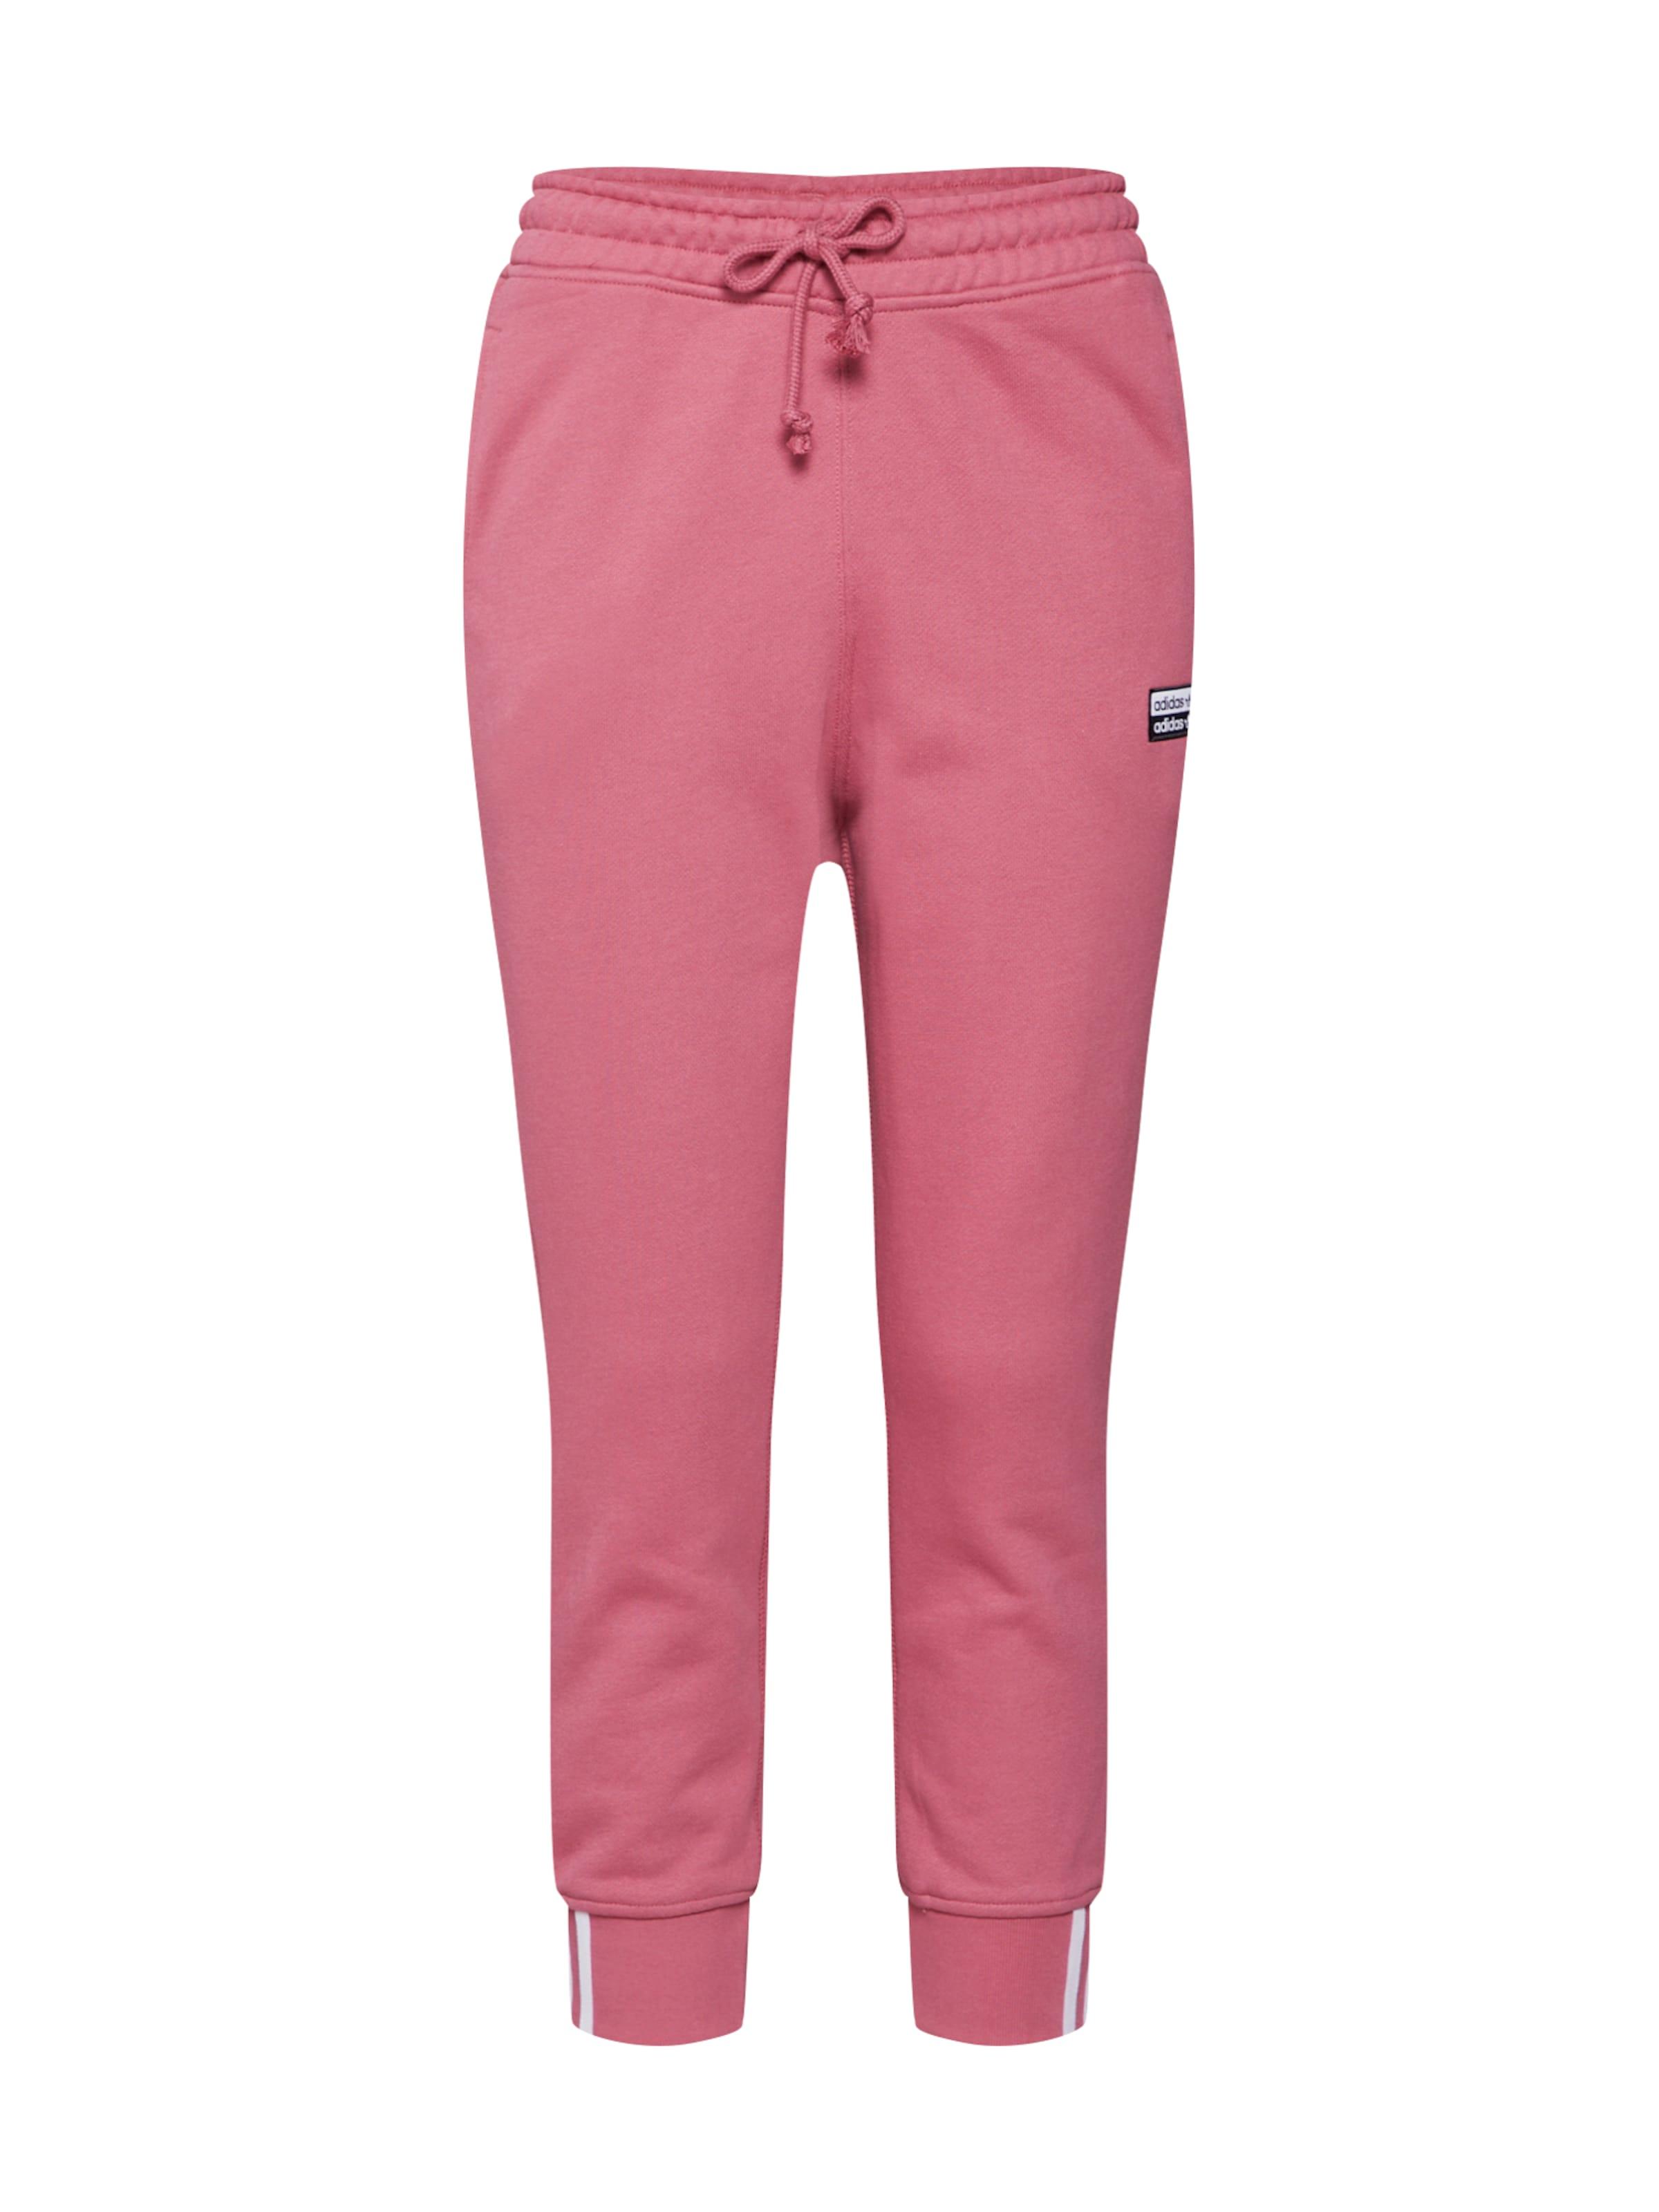 'vocal' En Noir Pantalon Adidas Originals TF13lJcK